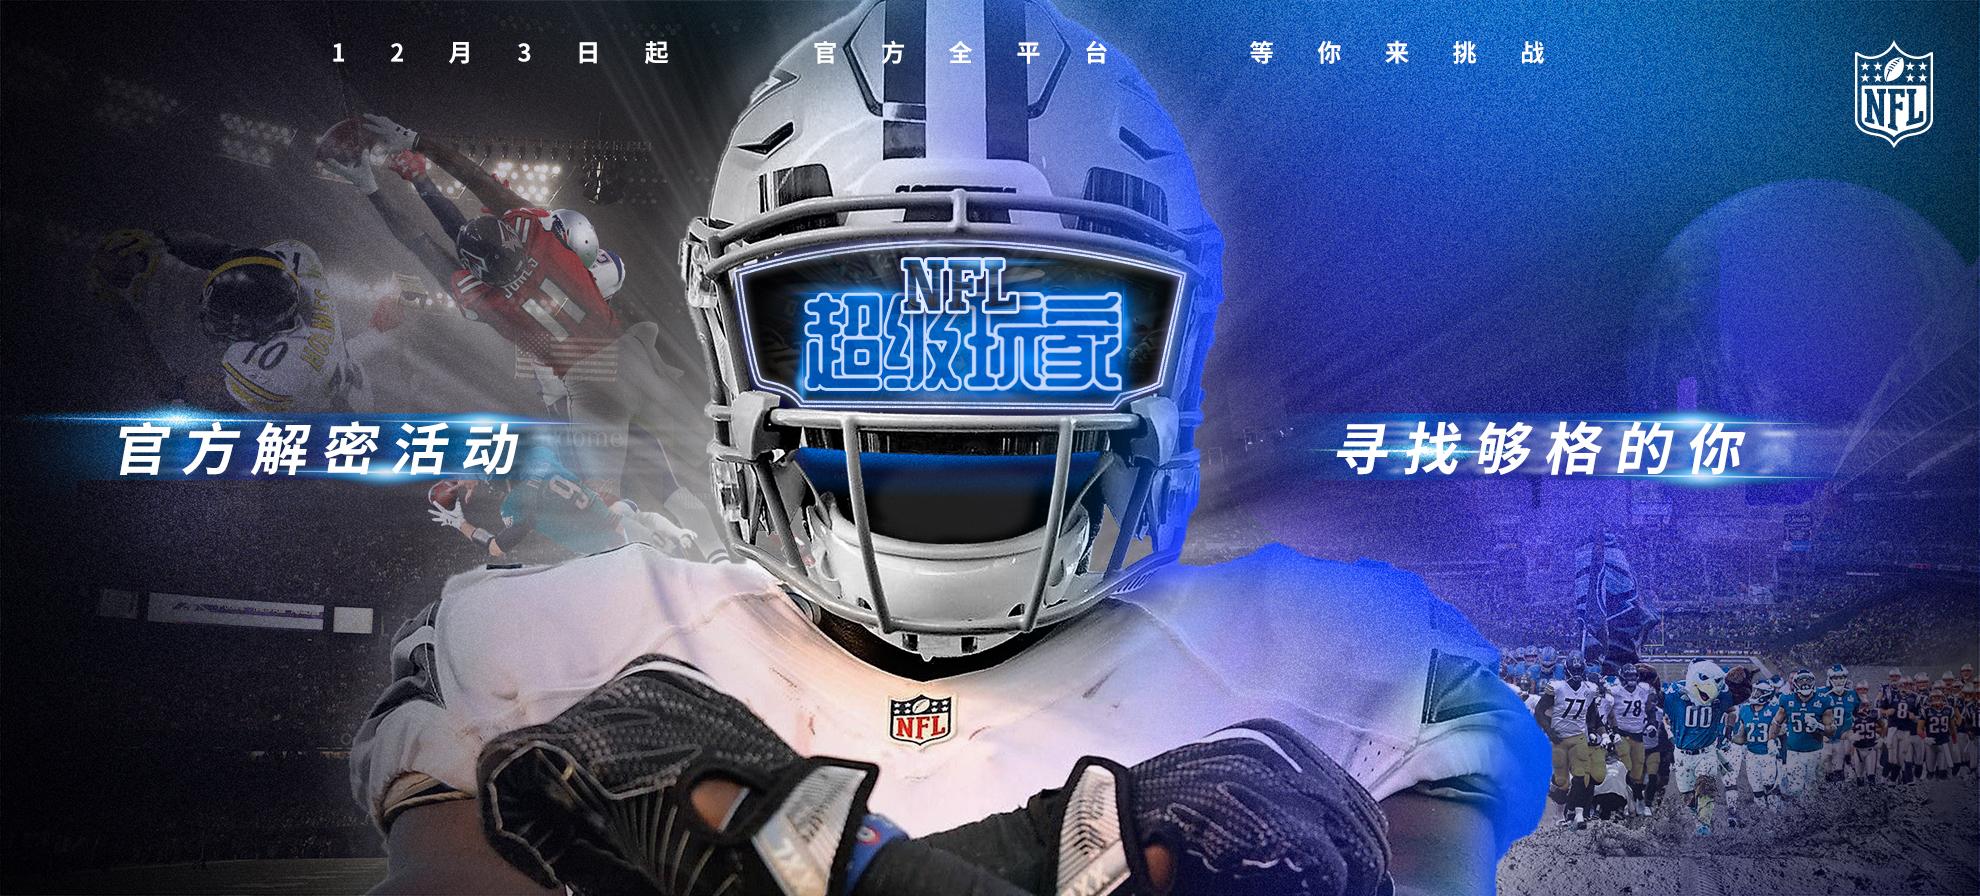 NFL超级玩家最后一关!关卡三任务指引